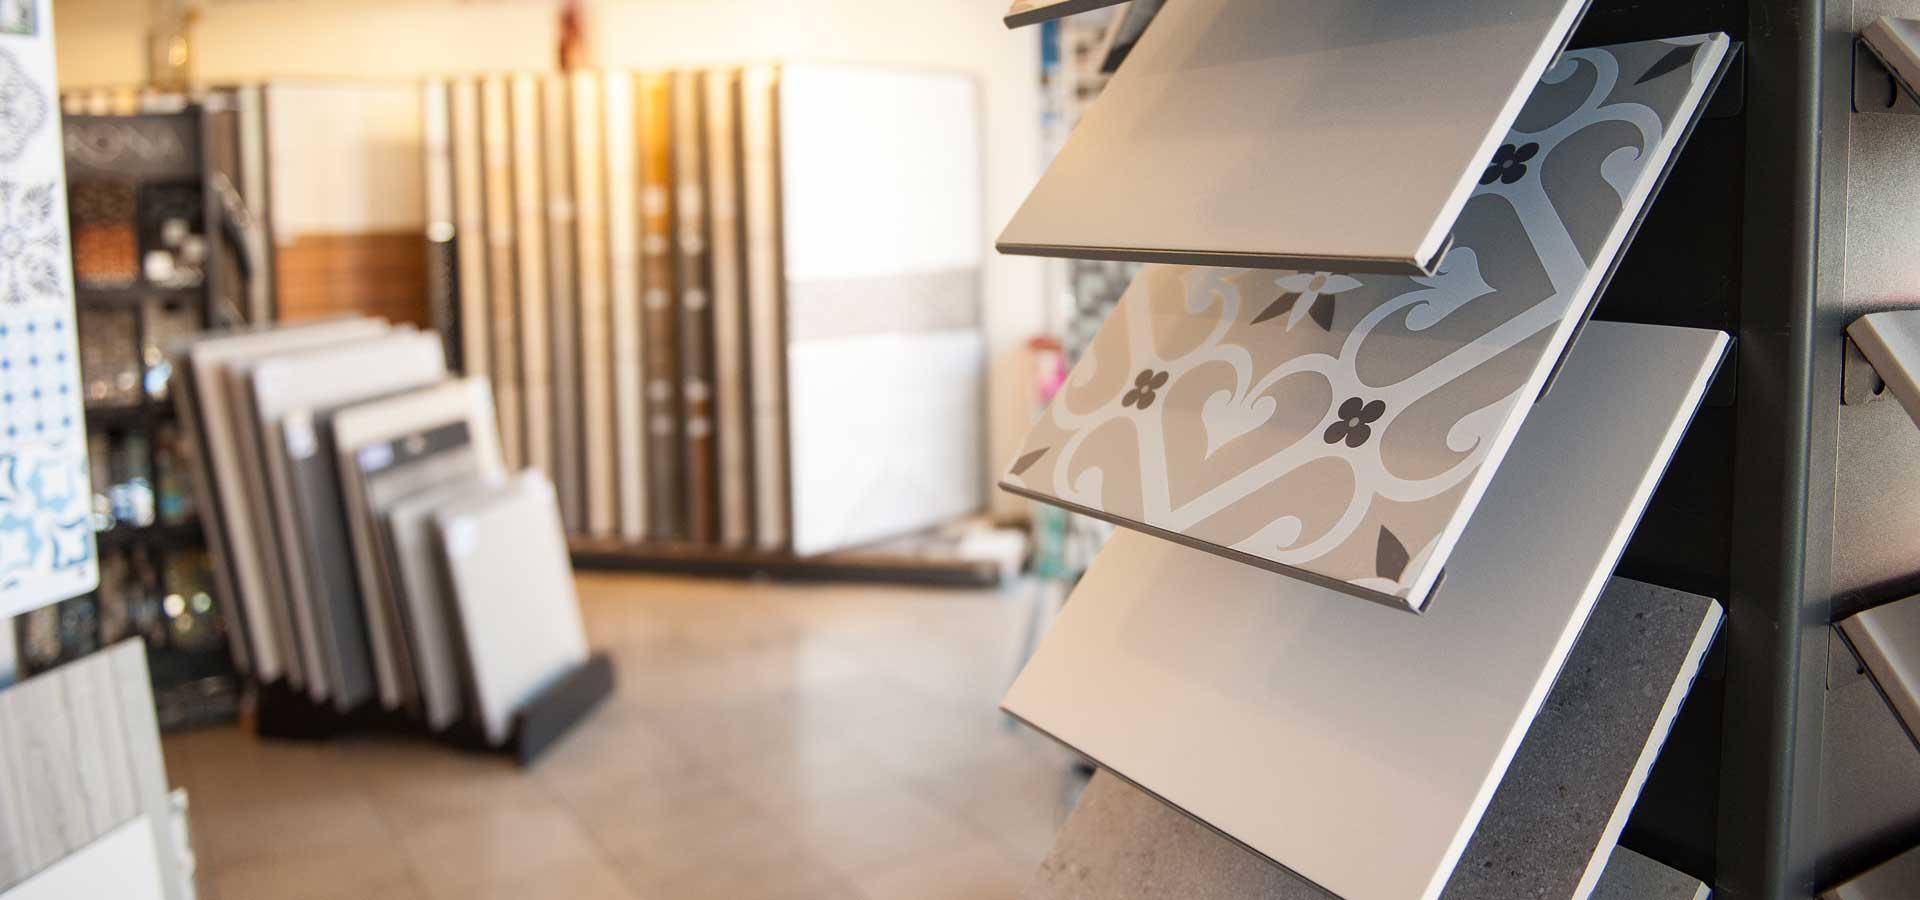 Maidenhead Tile And Wood Flooring Showroom Ers Showrooms